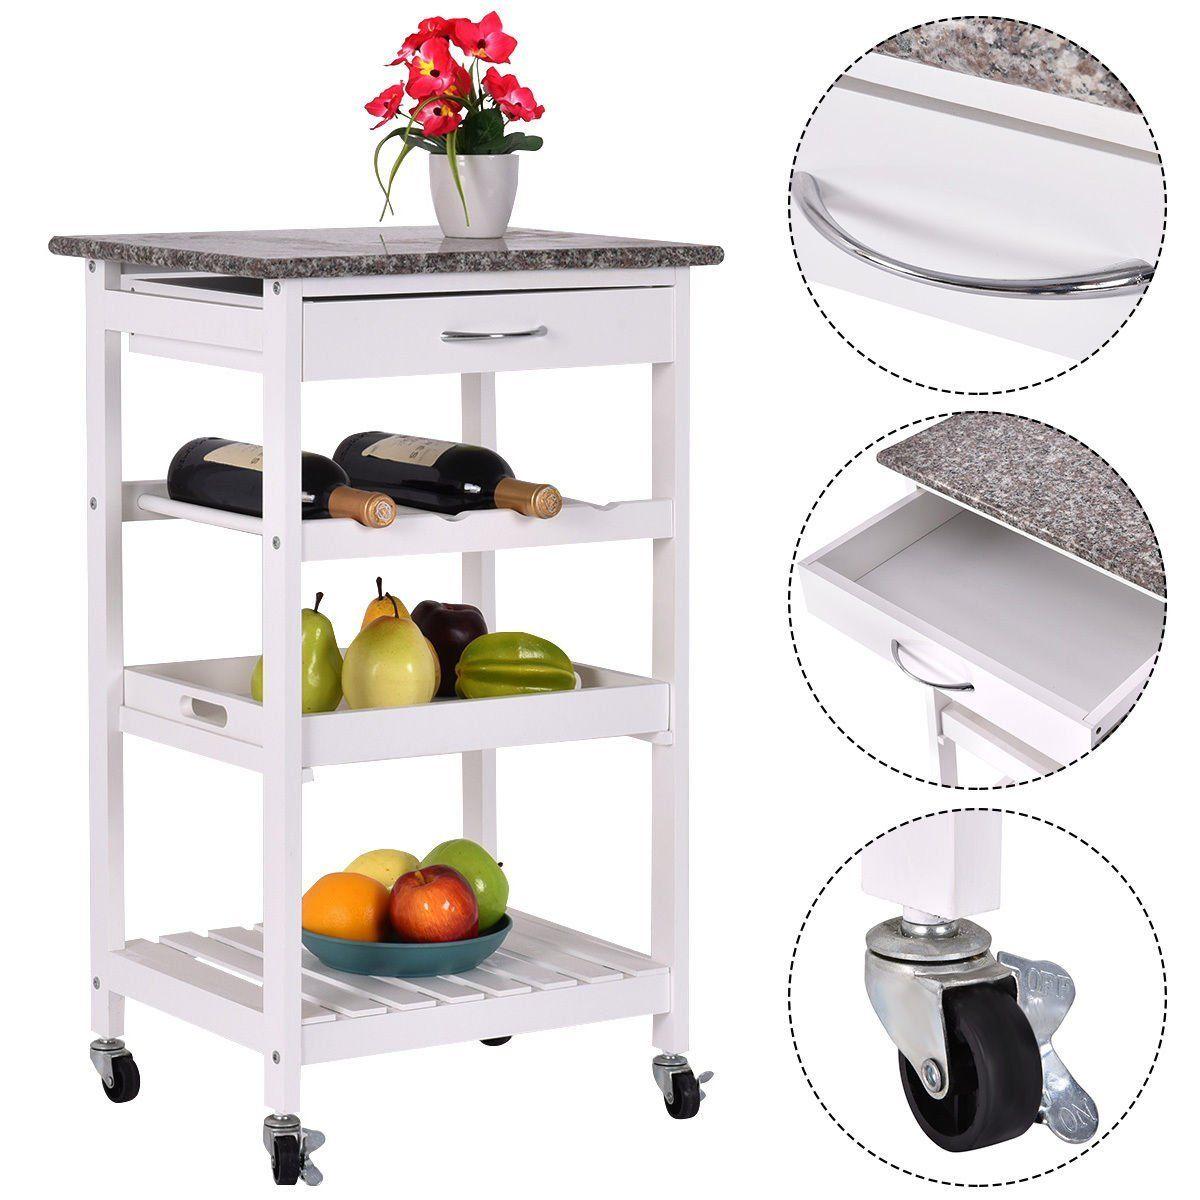 4-Tier Rolling Wood Kitchen Trolley Island Cart Storage Shelf Drawer ...